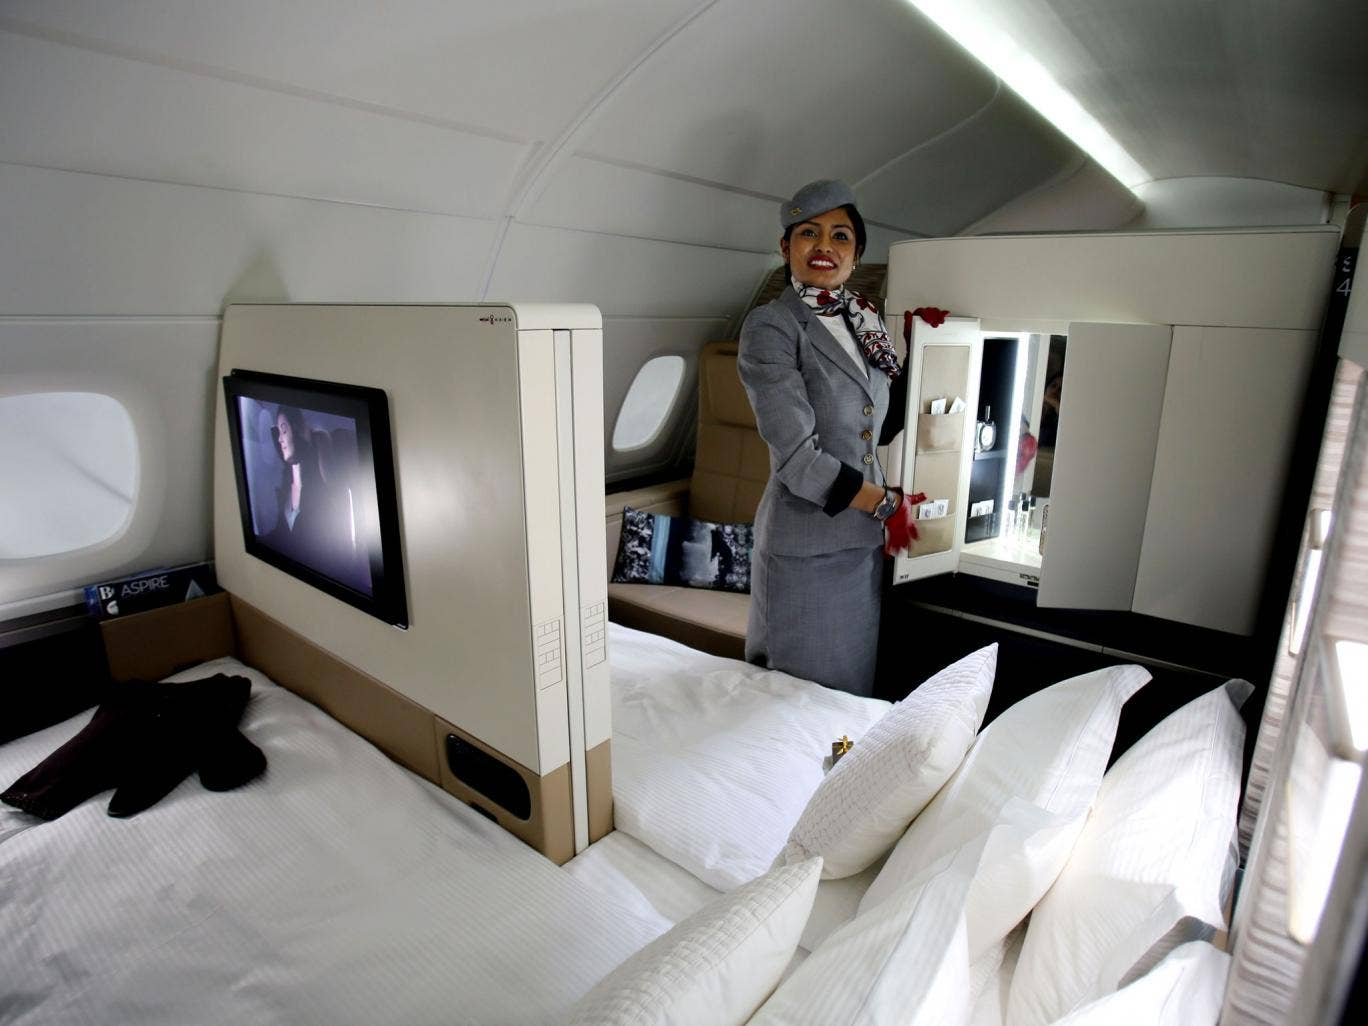 An Etihad Airways official stands inside a mock-up first class cabin,